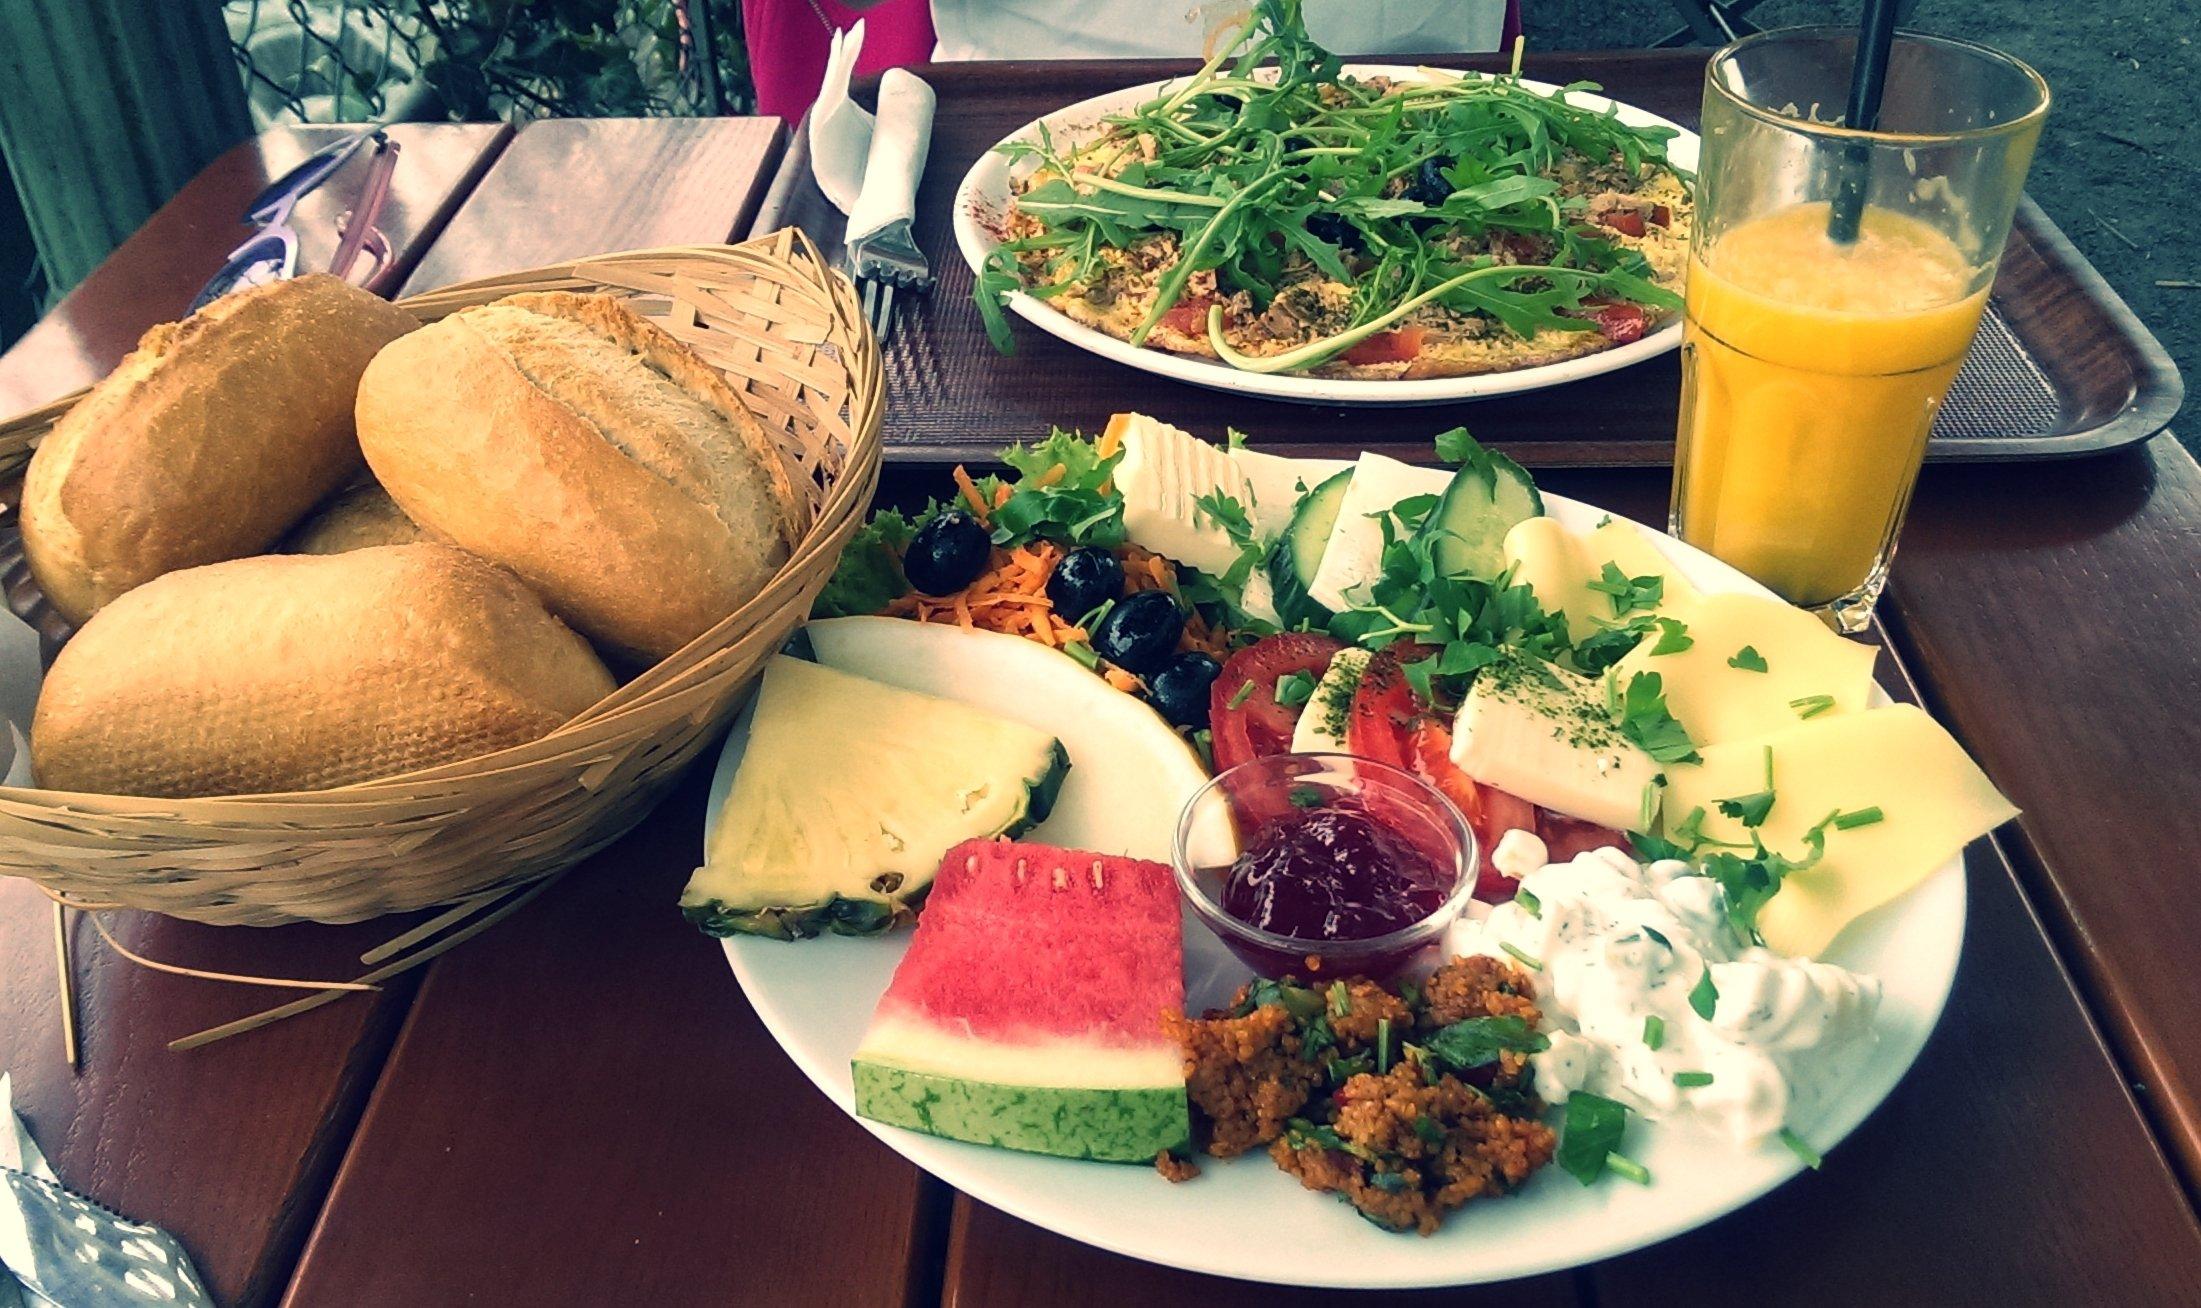 Best brunch in Berlin @minkaguides